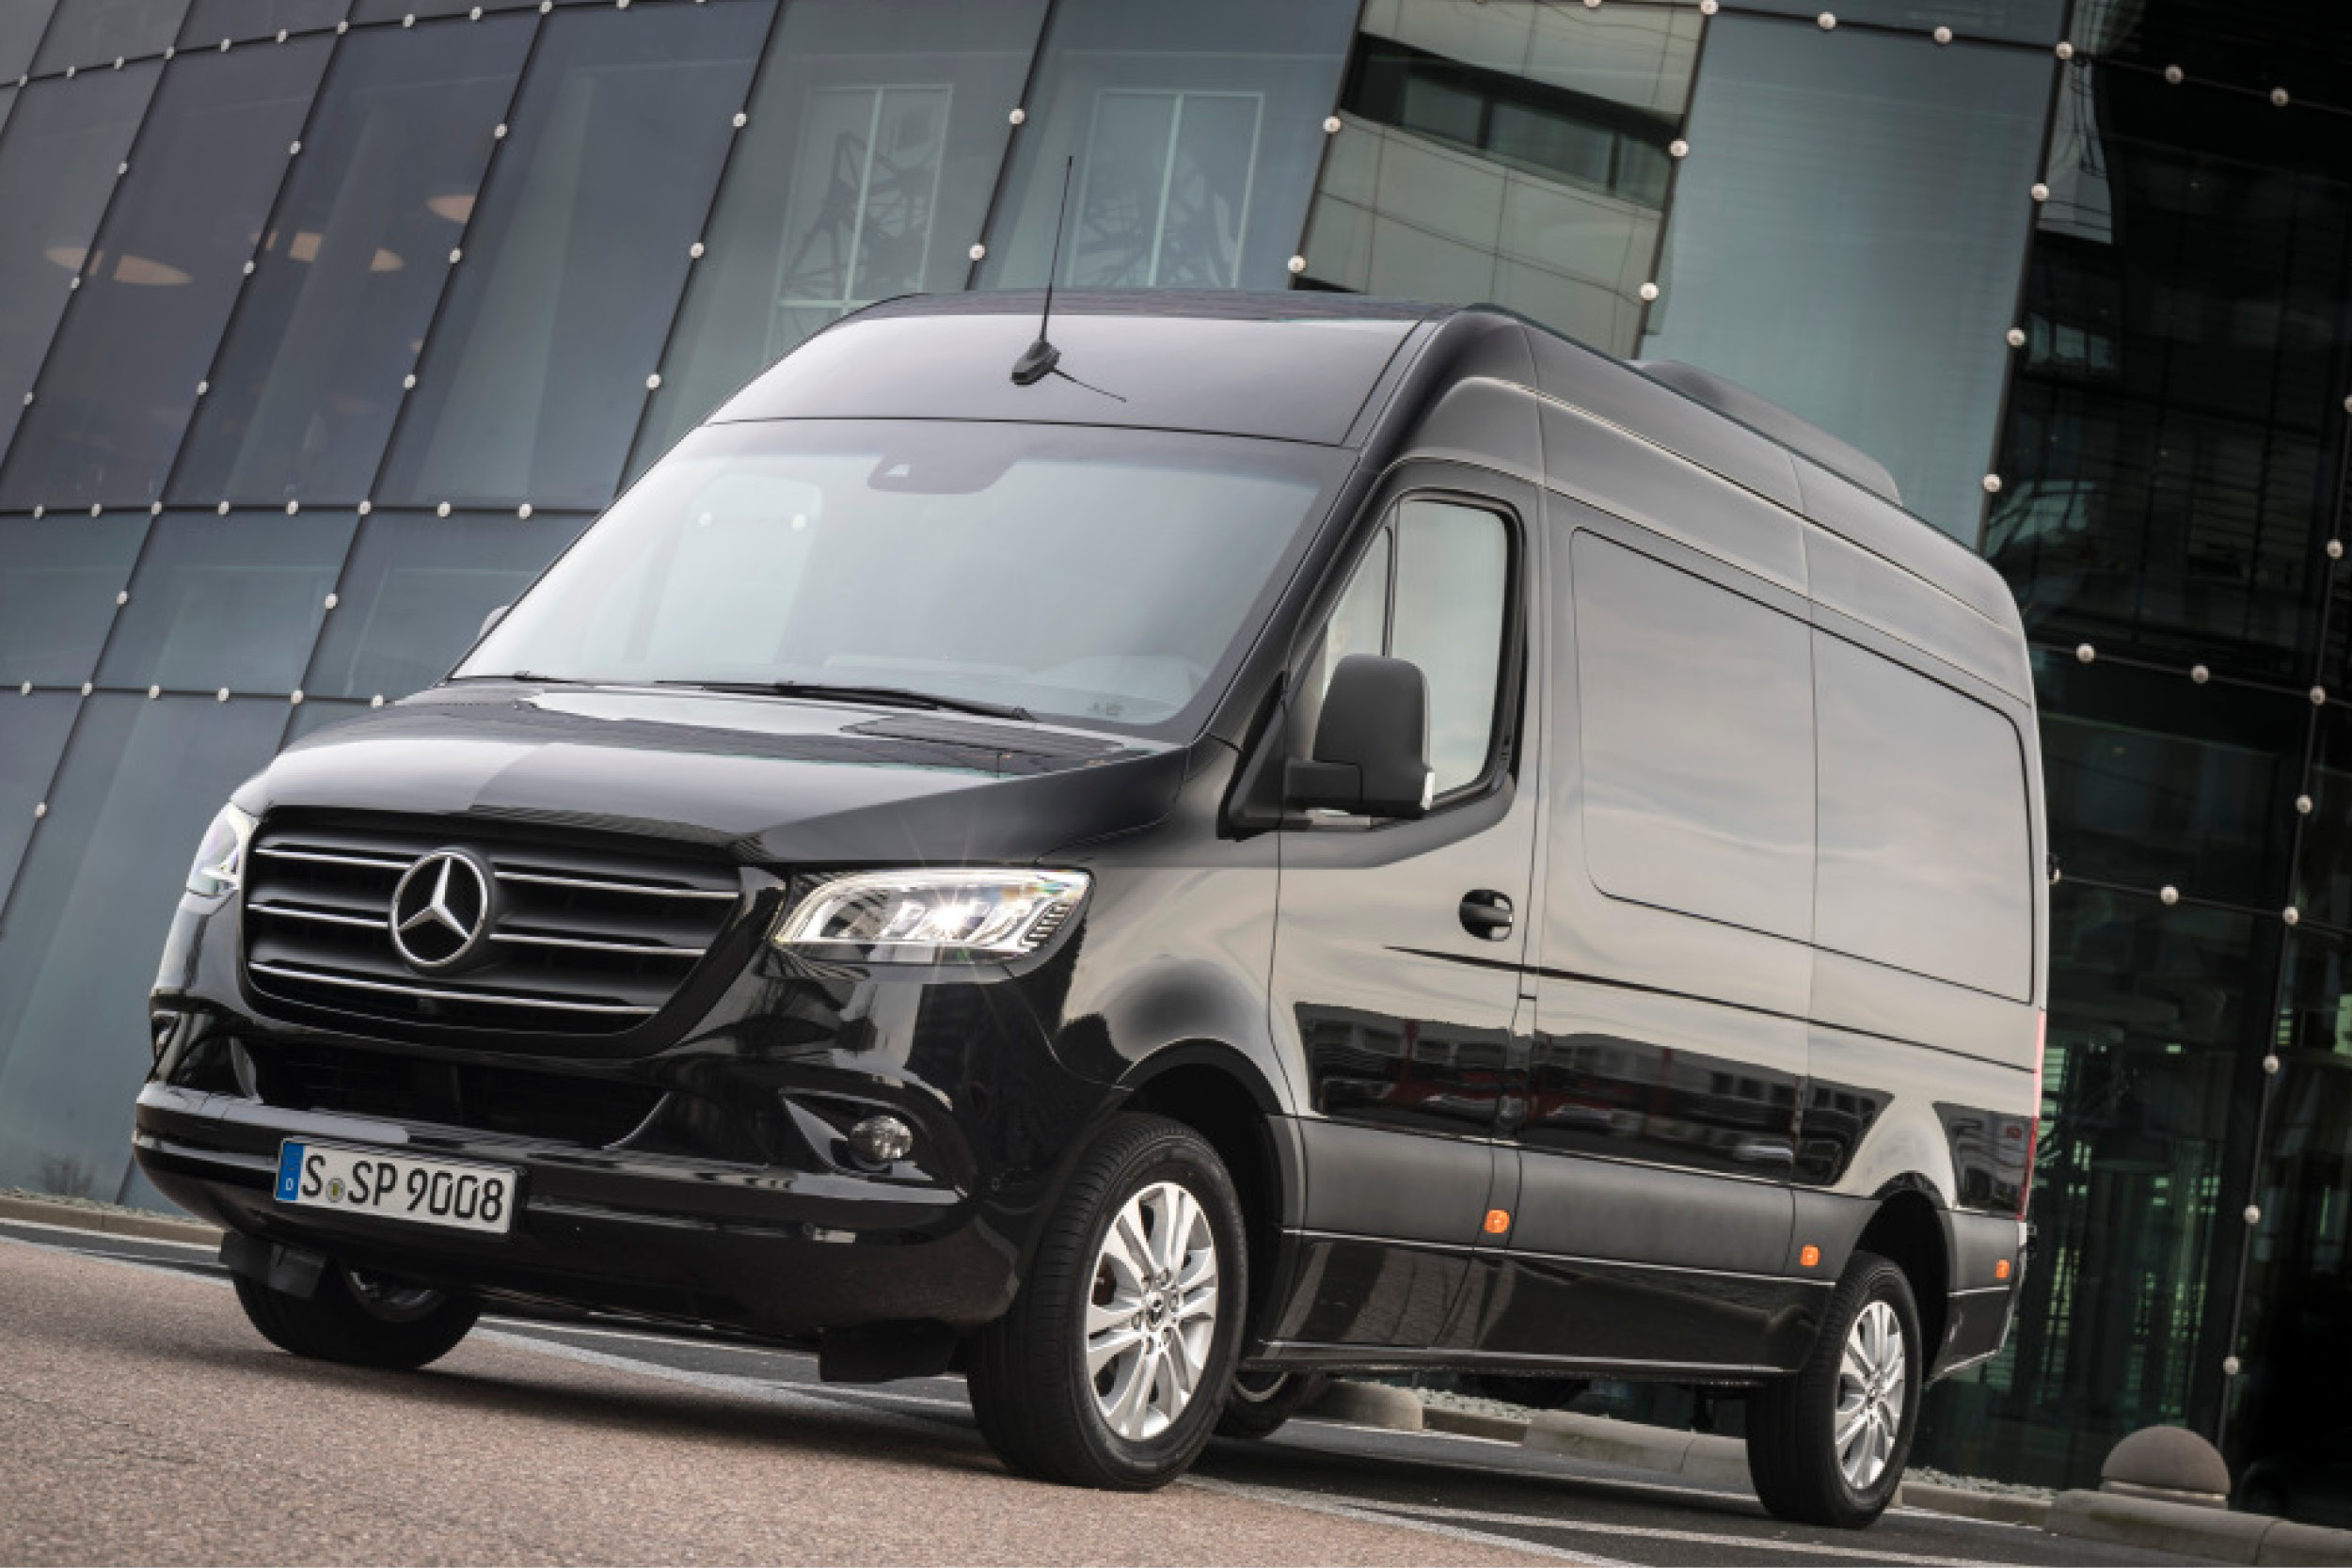 Mercedes Maybach GLS 600 Max Schultz Fond Interieur